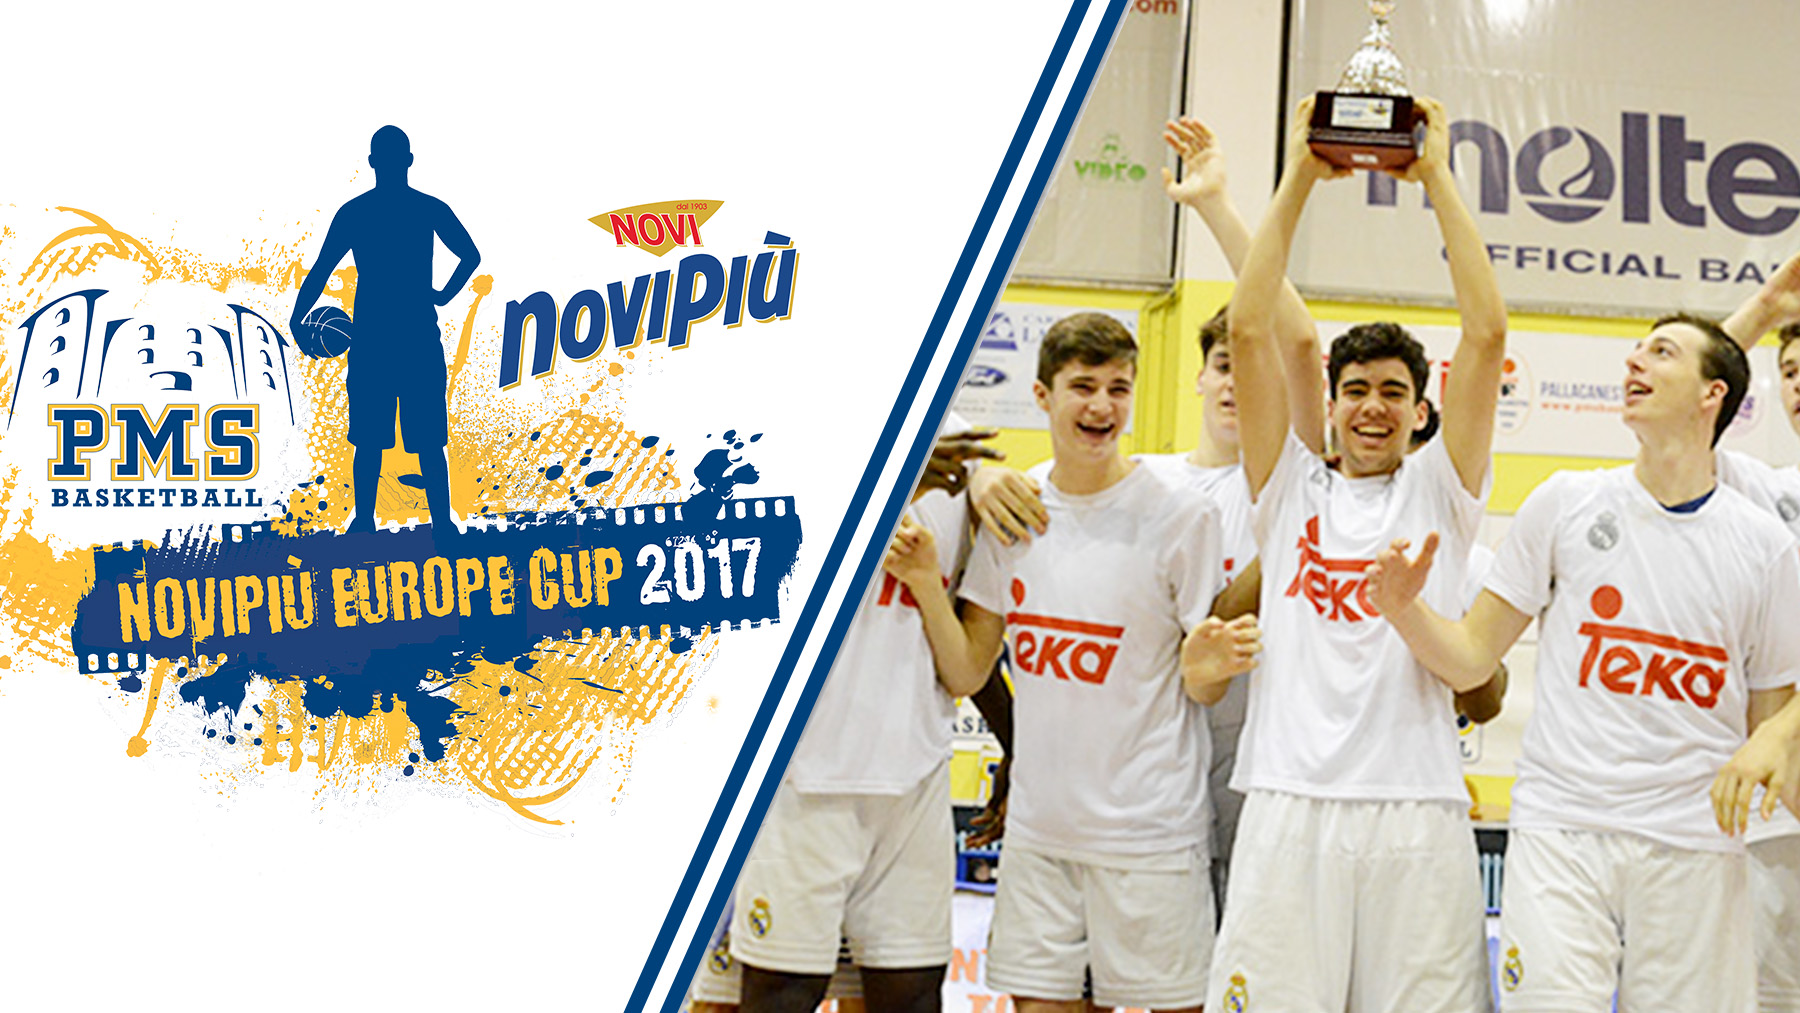 Novipiù Europe Cup 2017